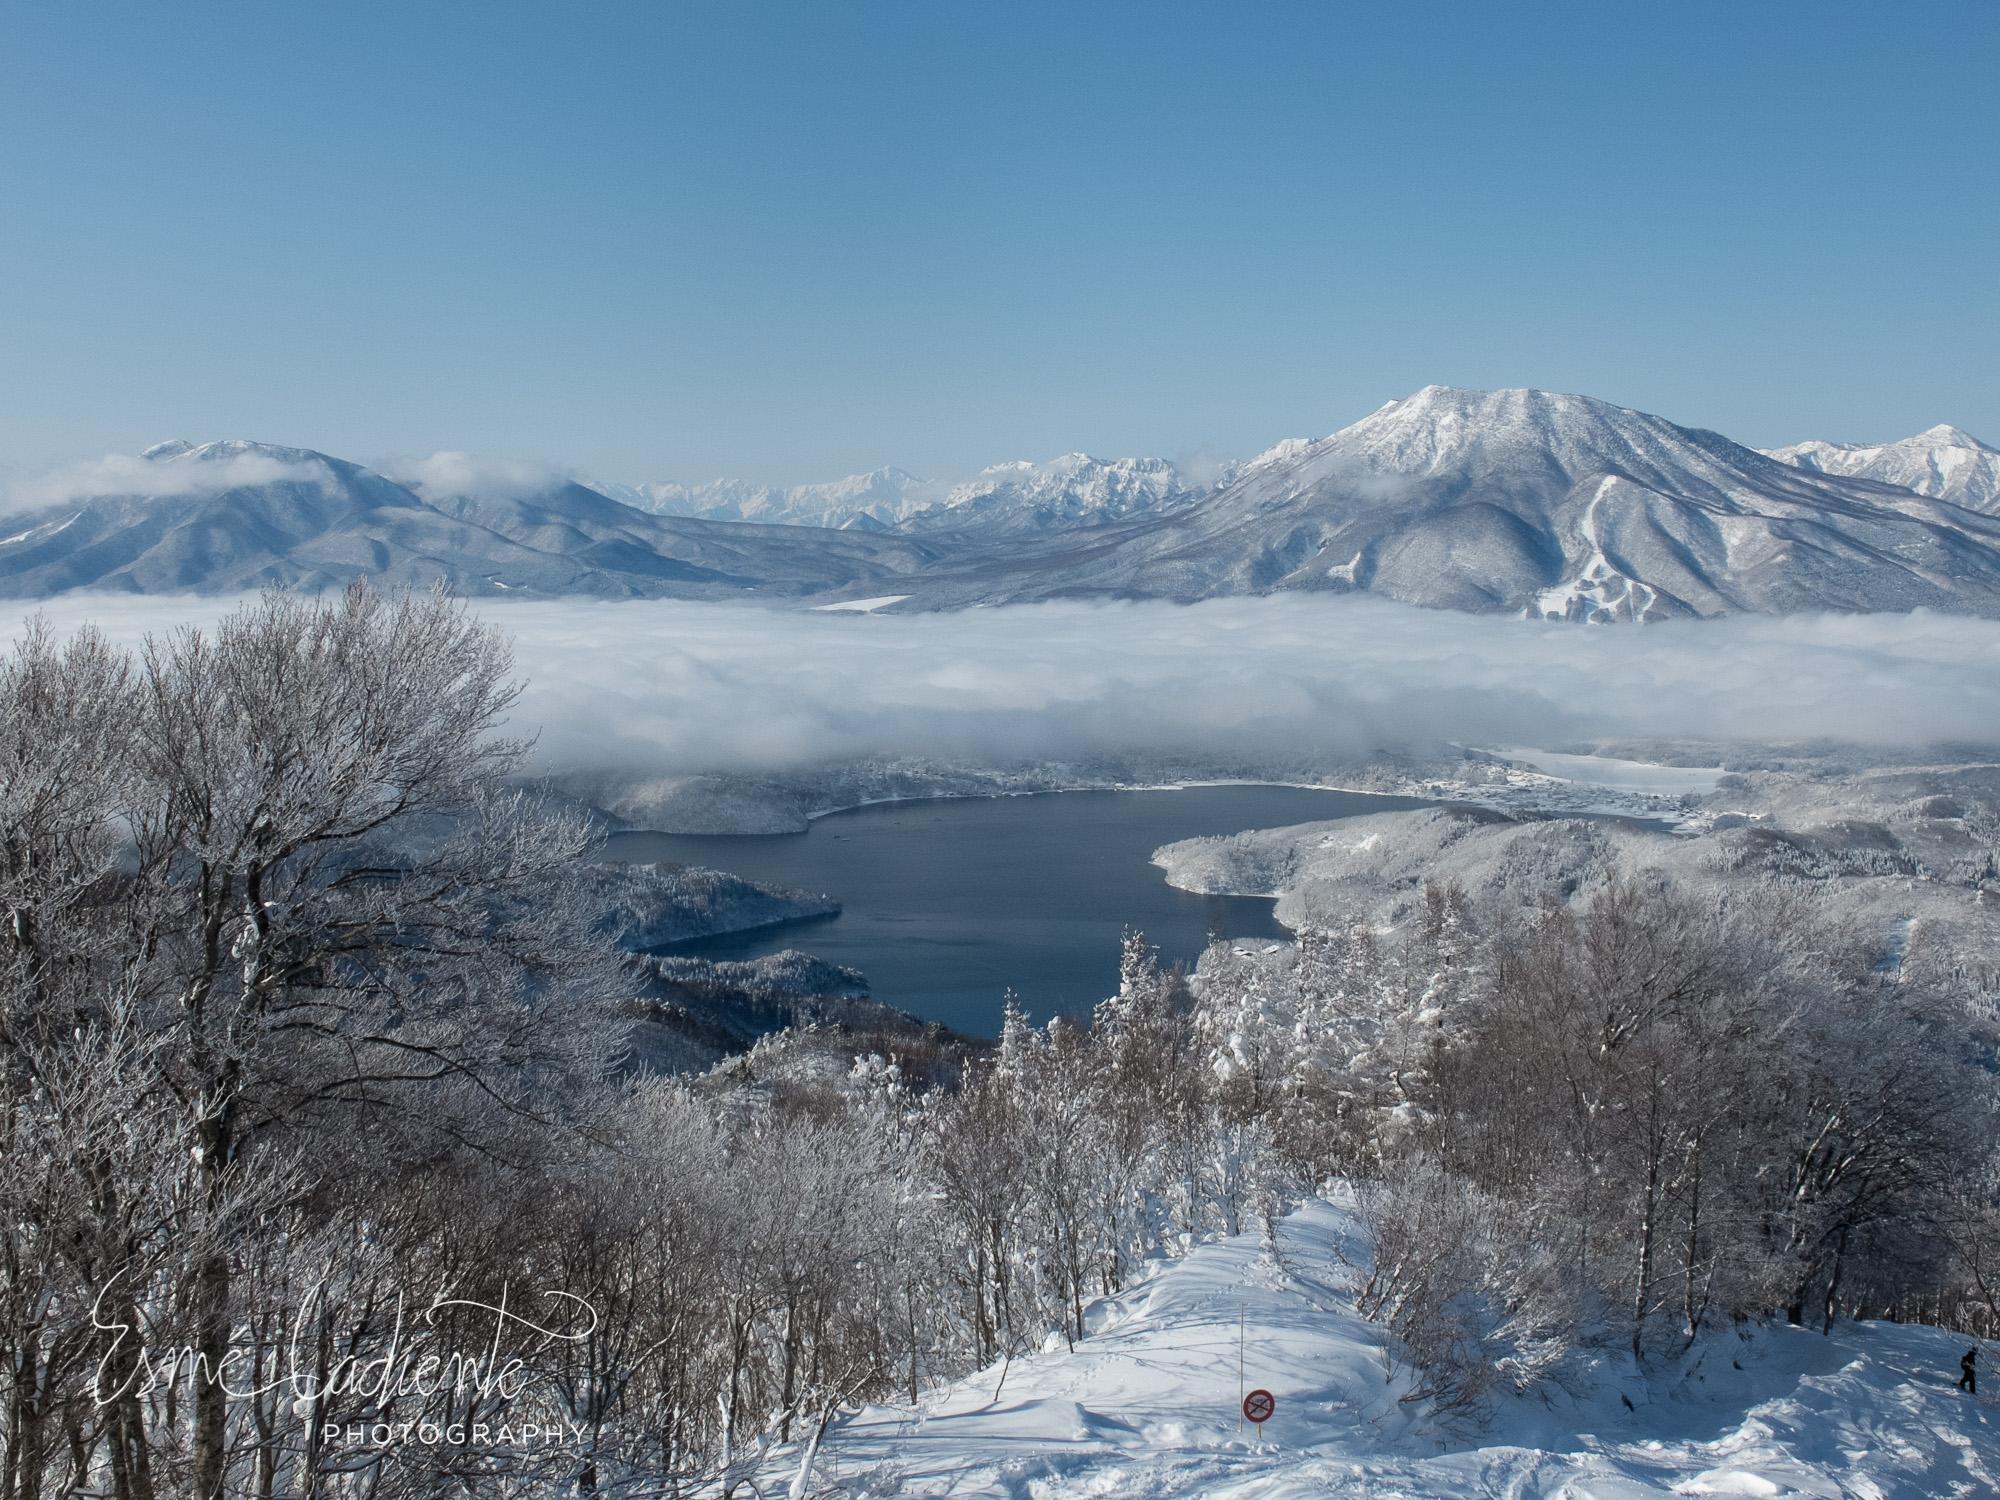 The view of Lake Nojiri from the ridge between Madarao and Tangram Ski Circus.